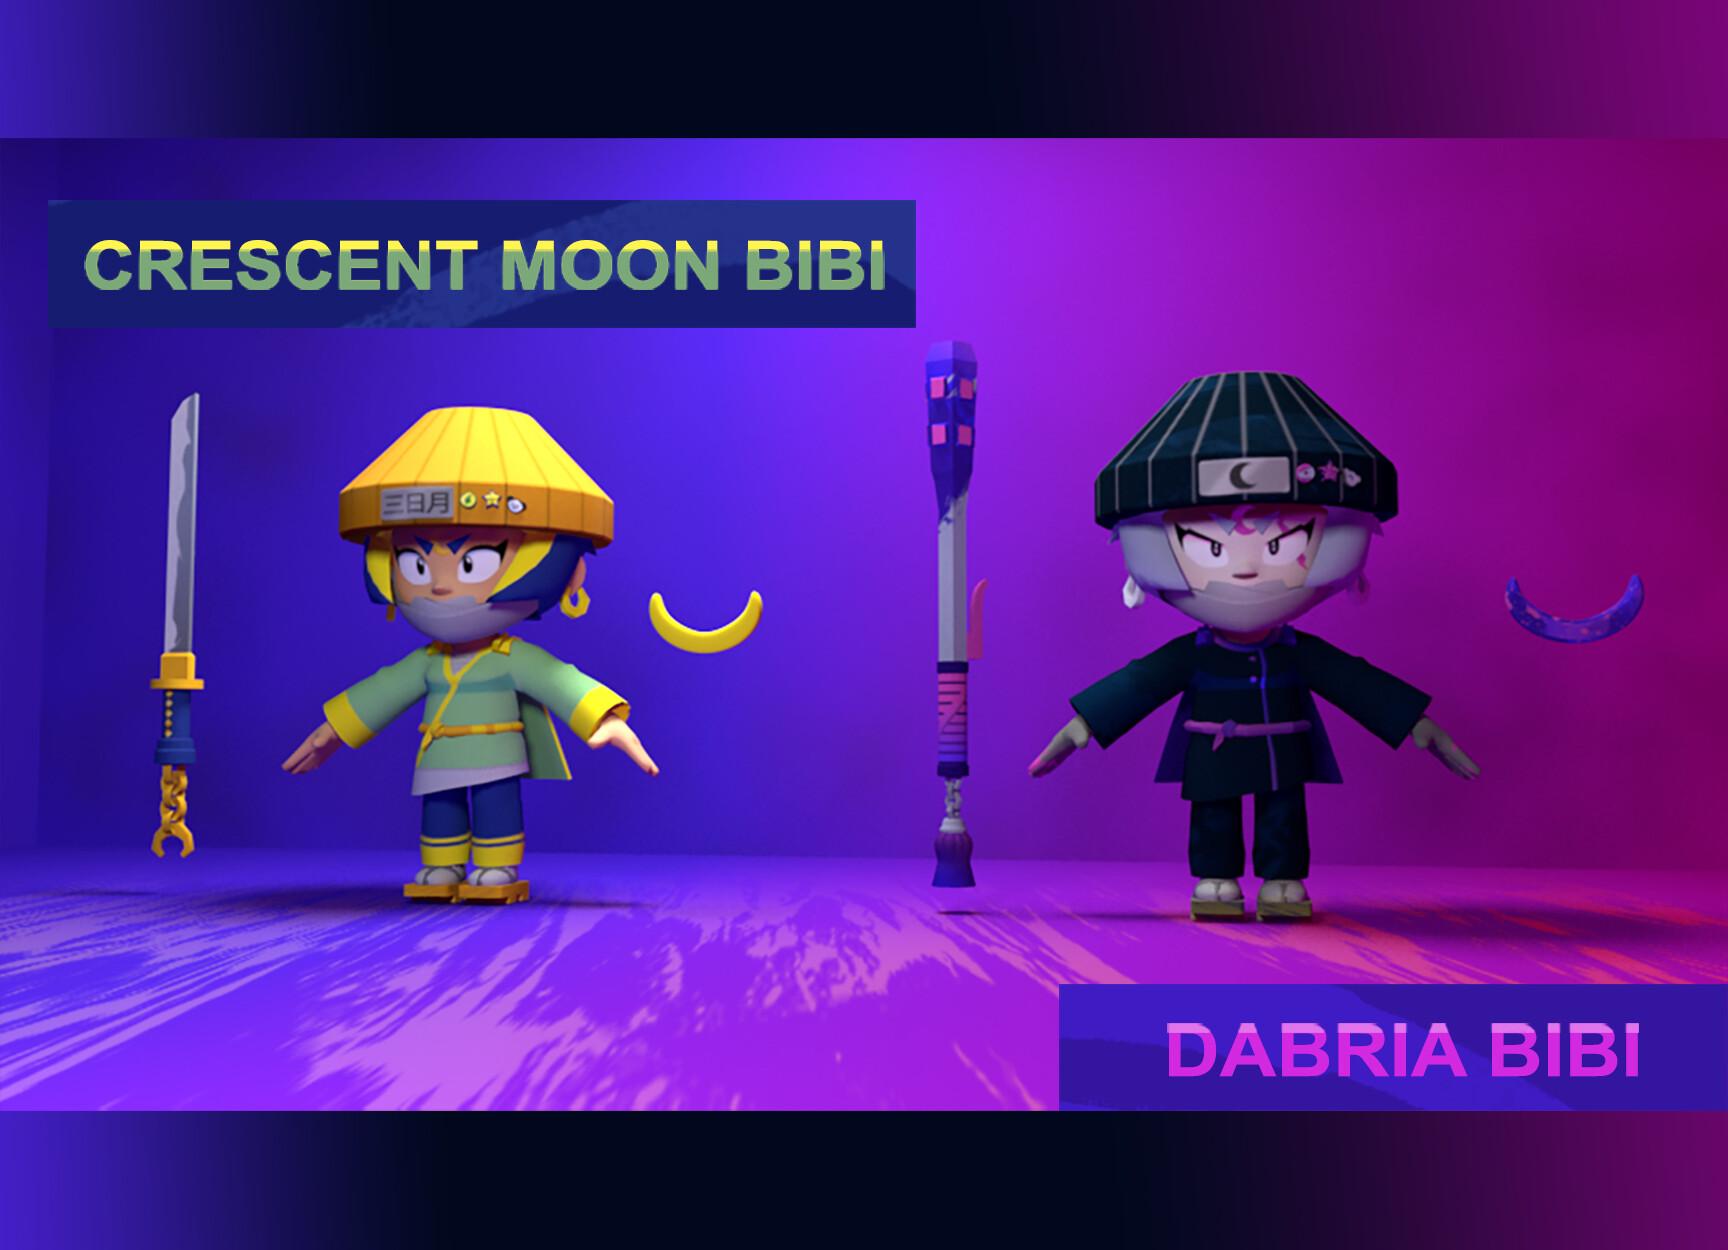 ArtStation - Crescent Moon Bibi & Dabria Bibi (Brawl Stars Skin